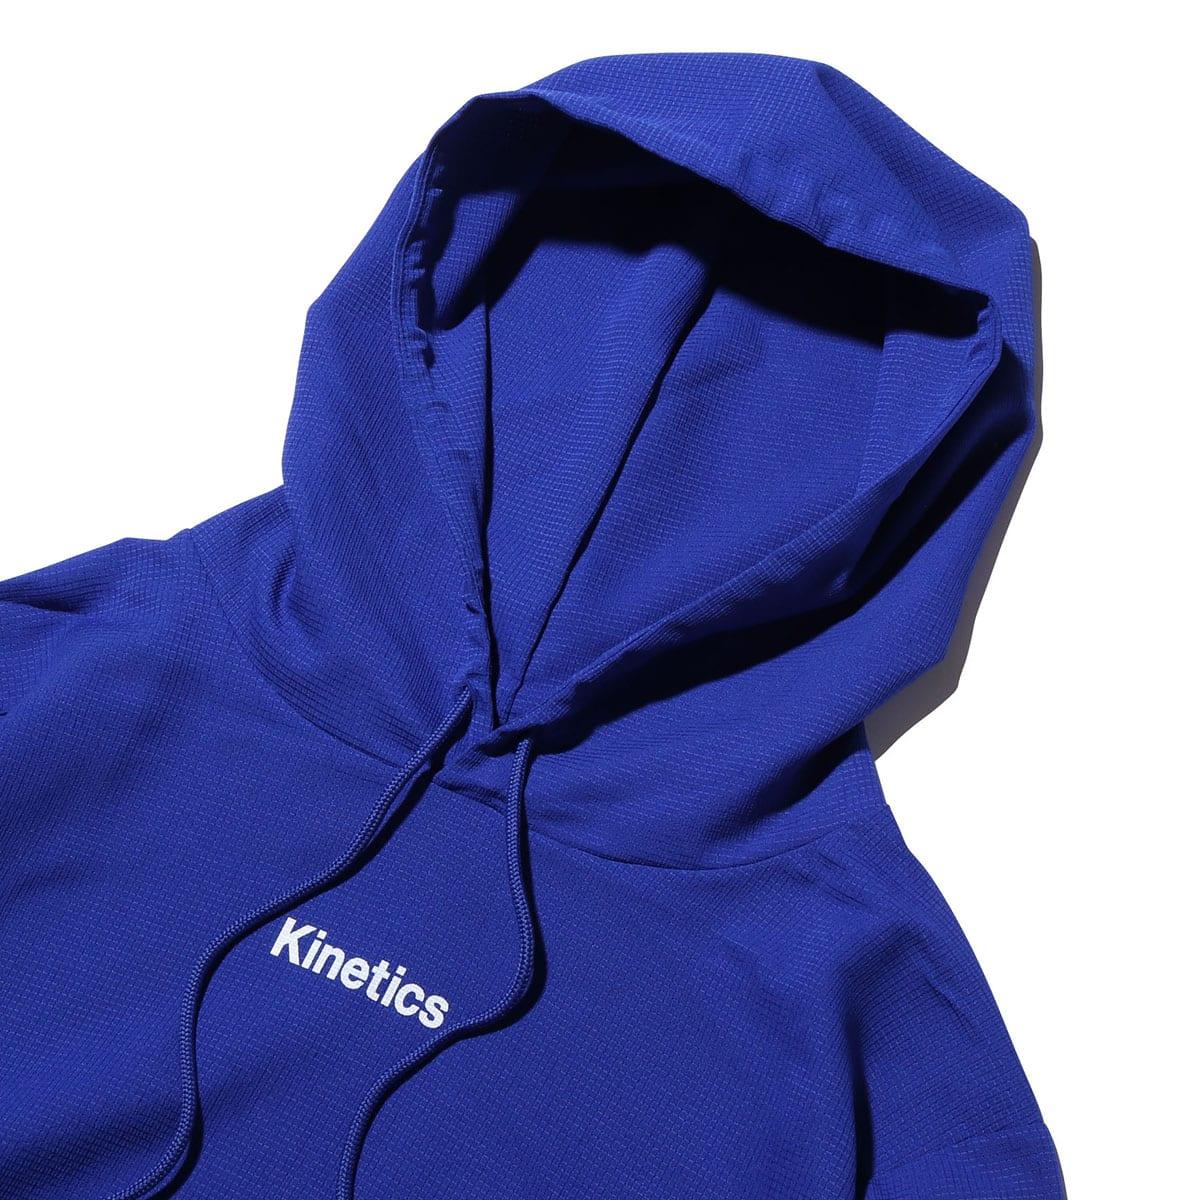 Practice safe sex light blue hoodie danny duncan